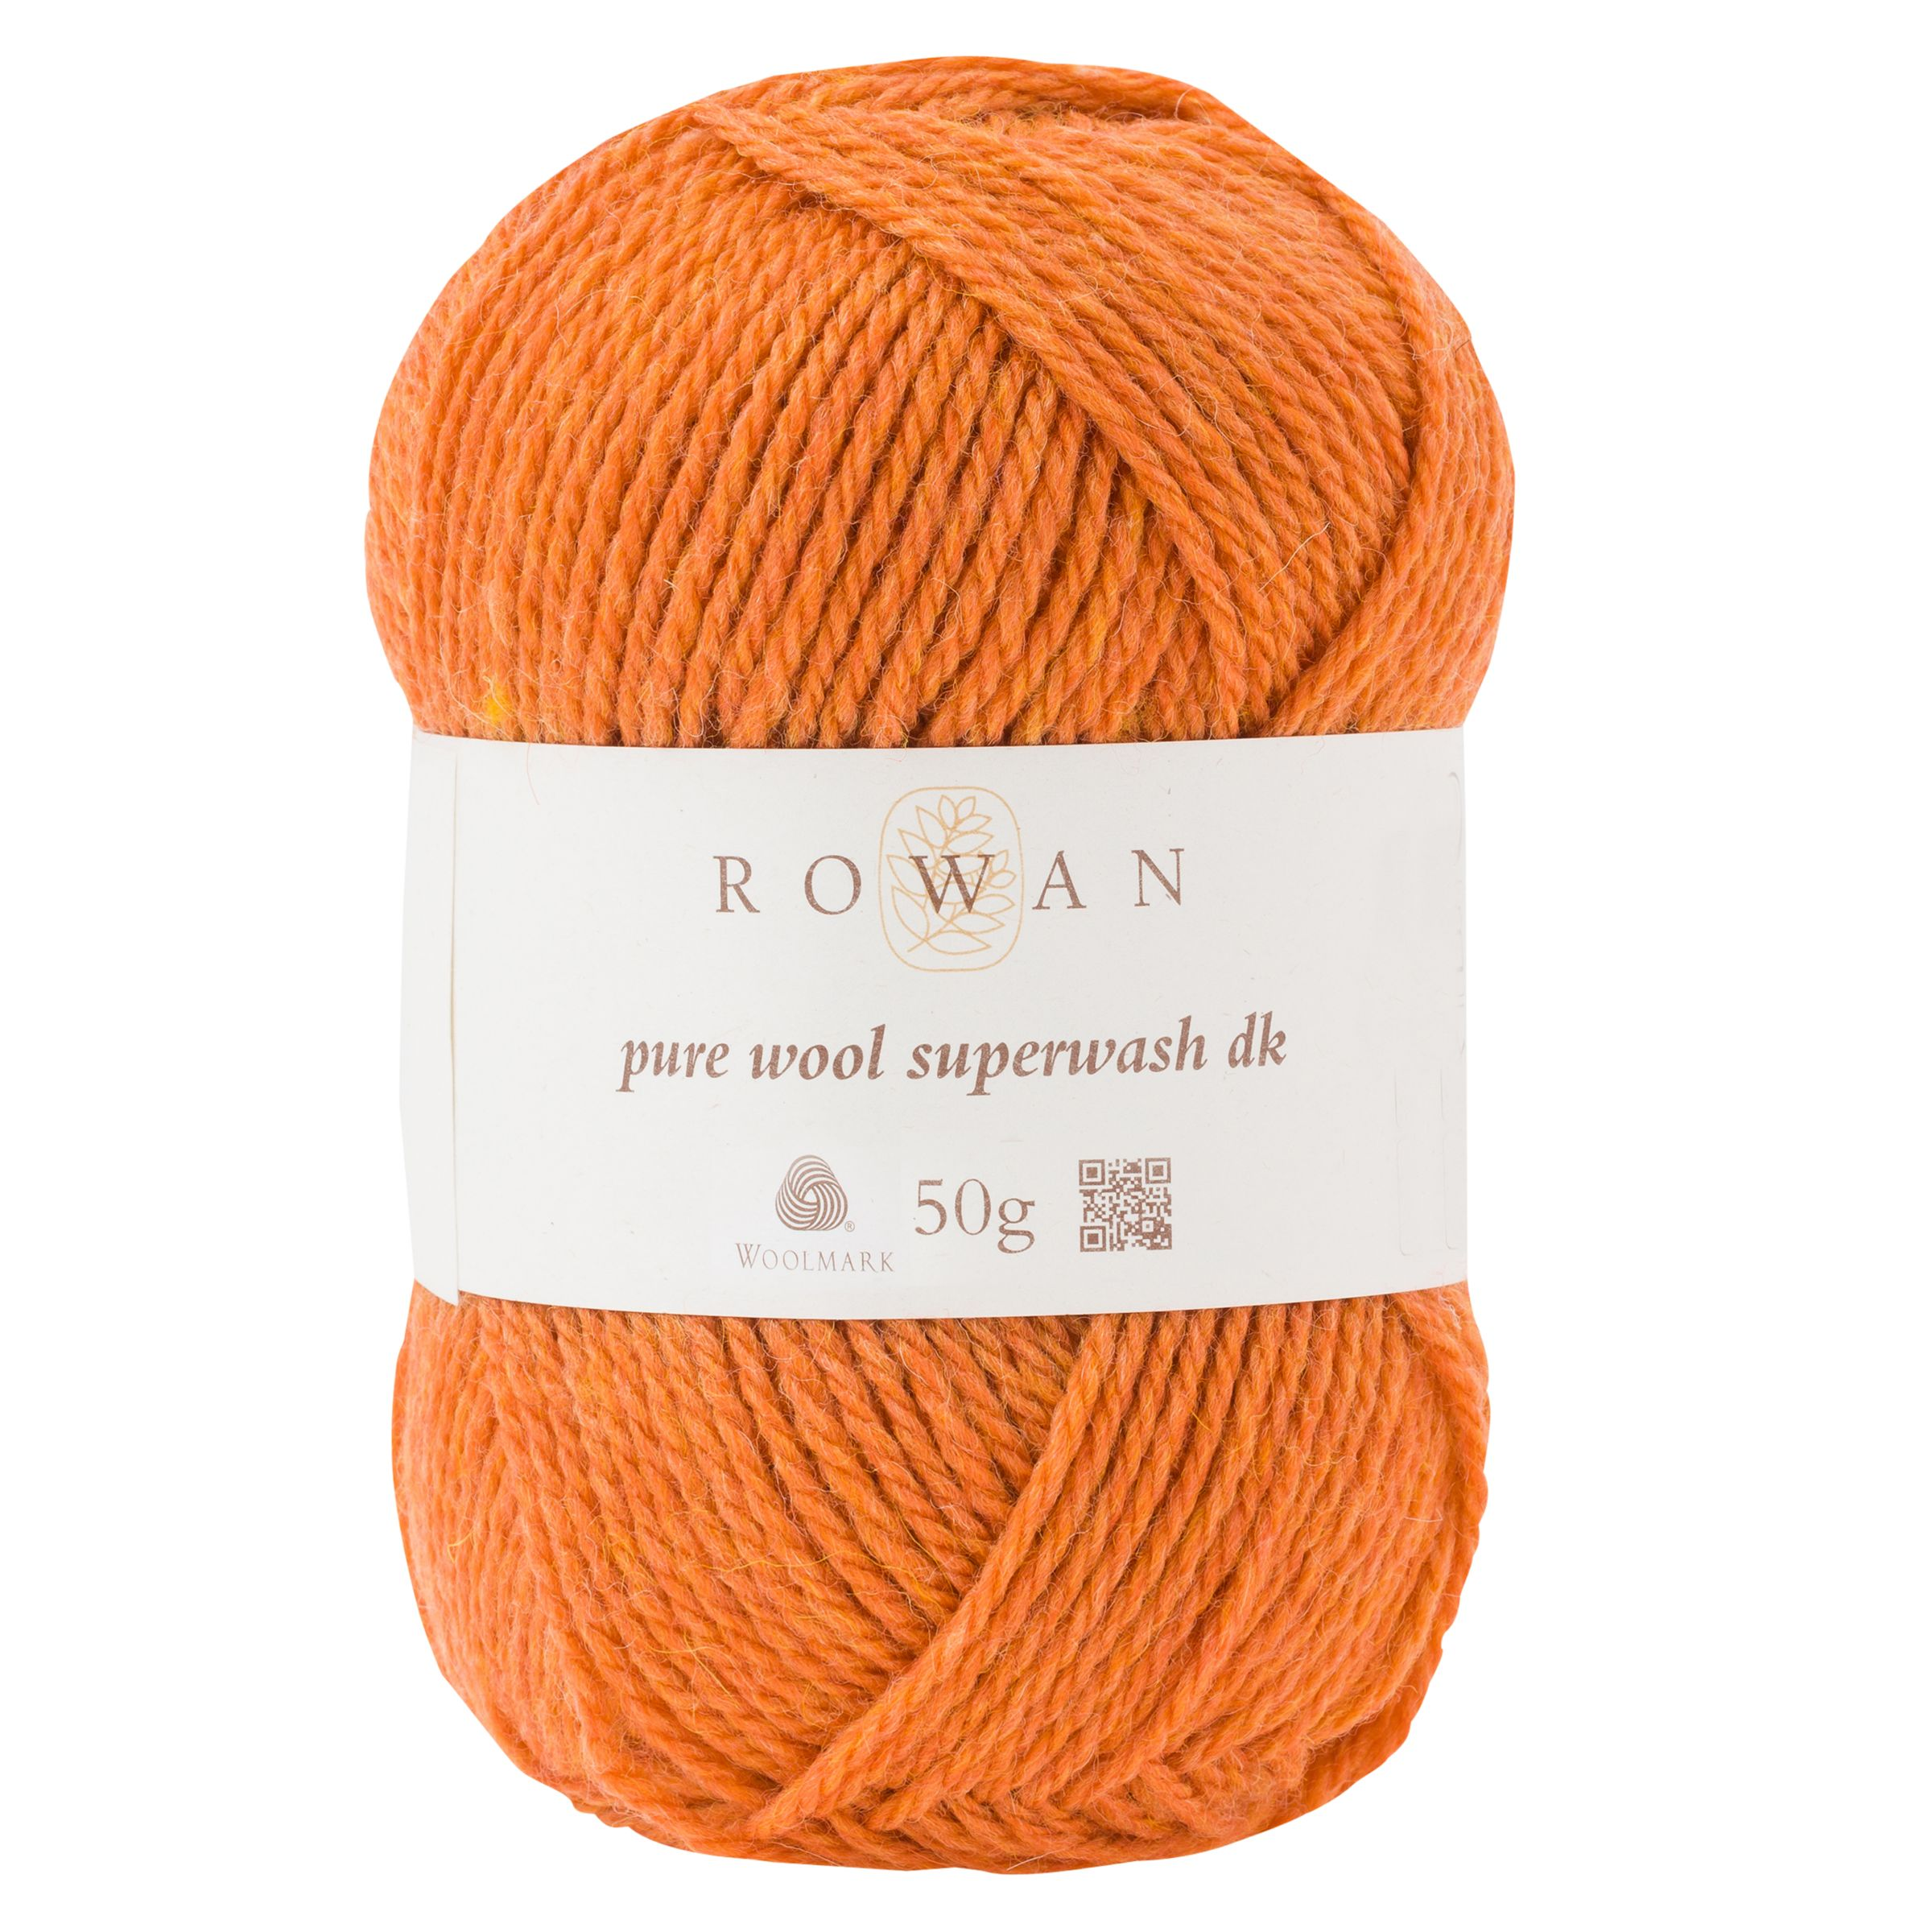 Rowan Rowan Pure Wool Superwash DK, 50g